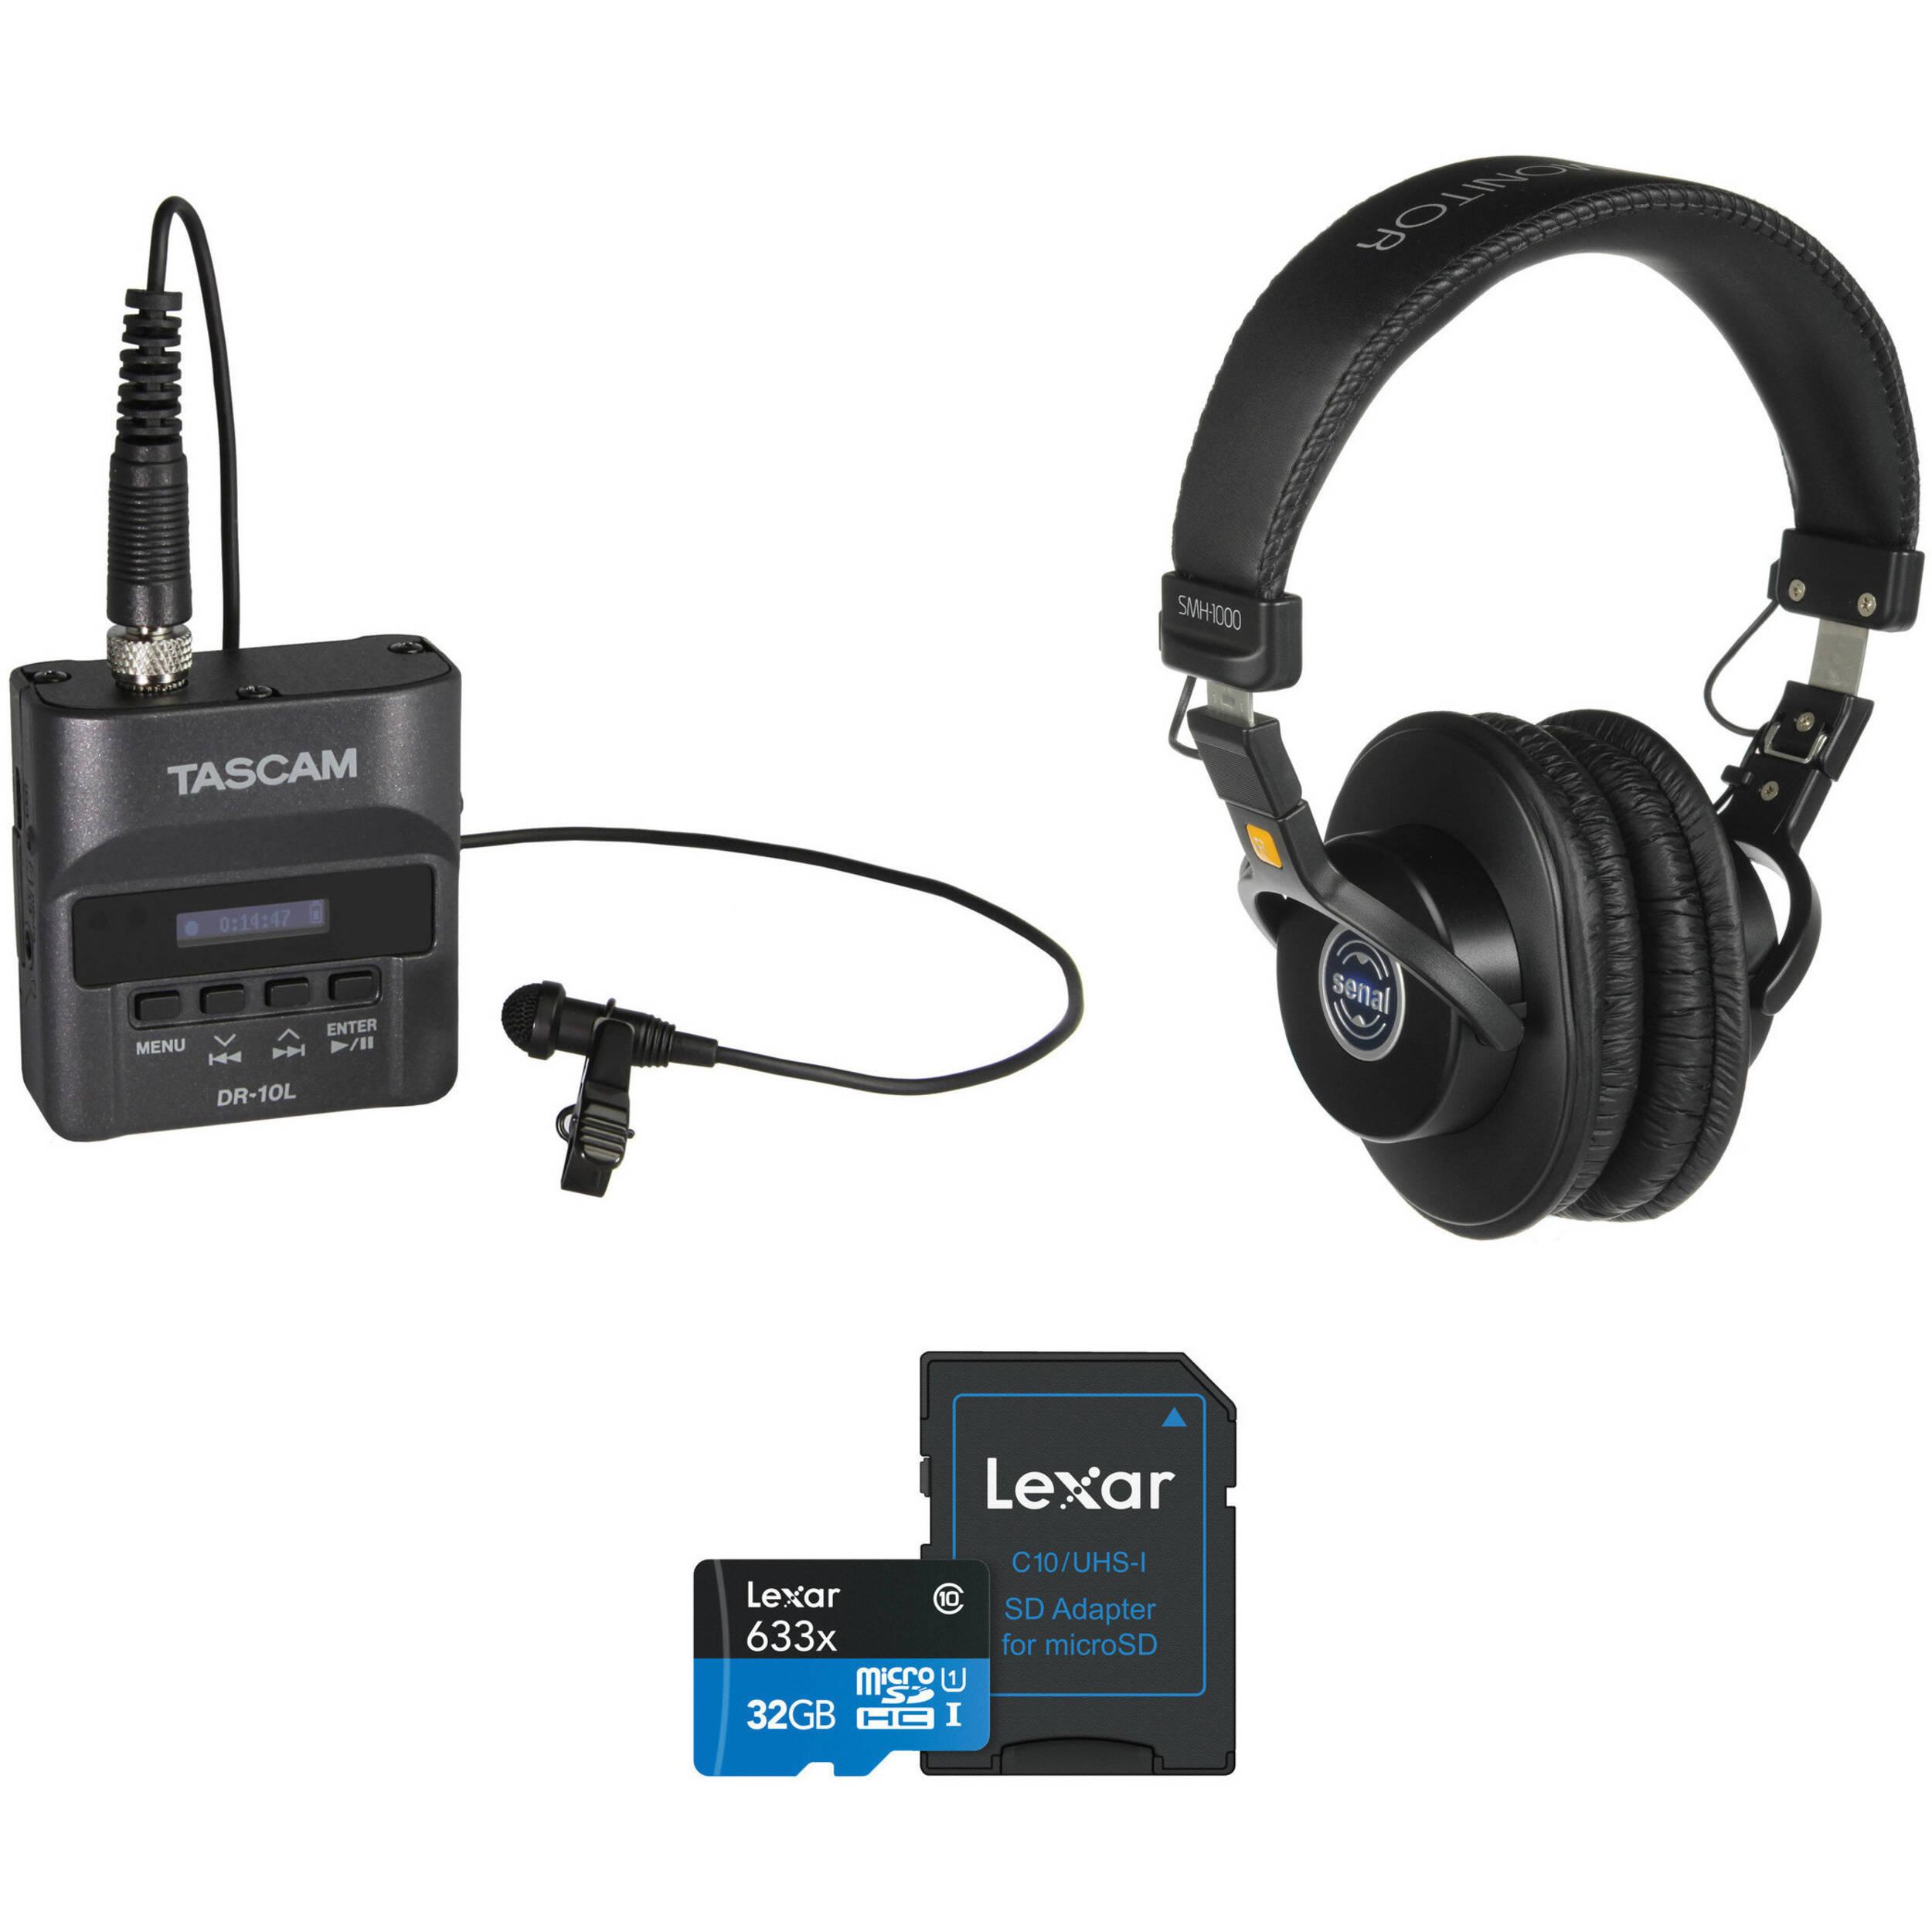 tascam dr 10l digital audio recorder kit with monitor headphones. Black Bedroom Furniture Sets. Home Design Ideas